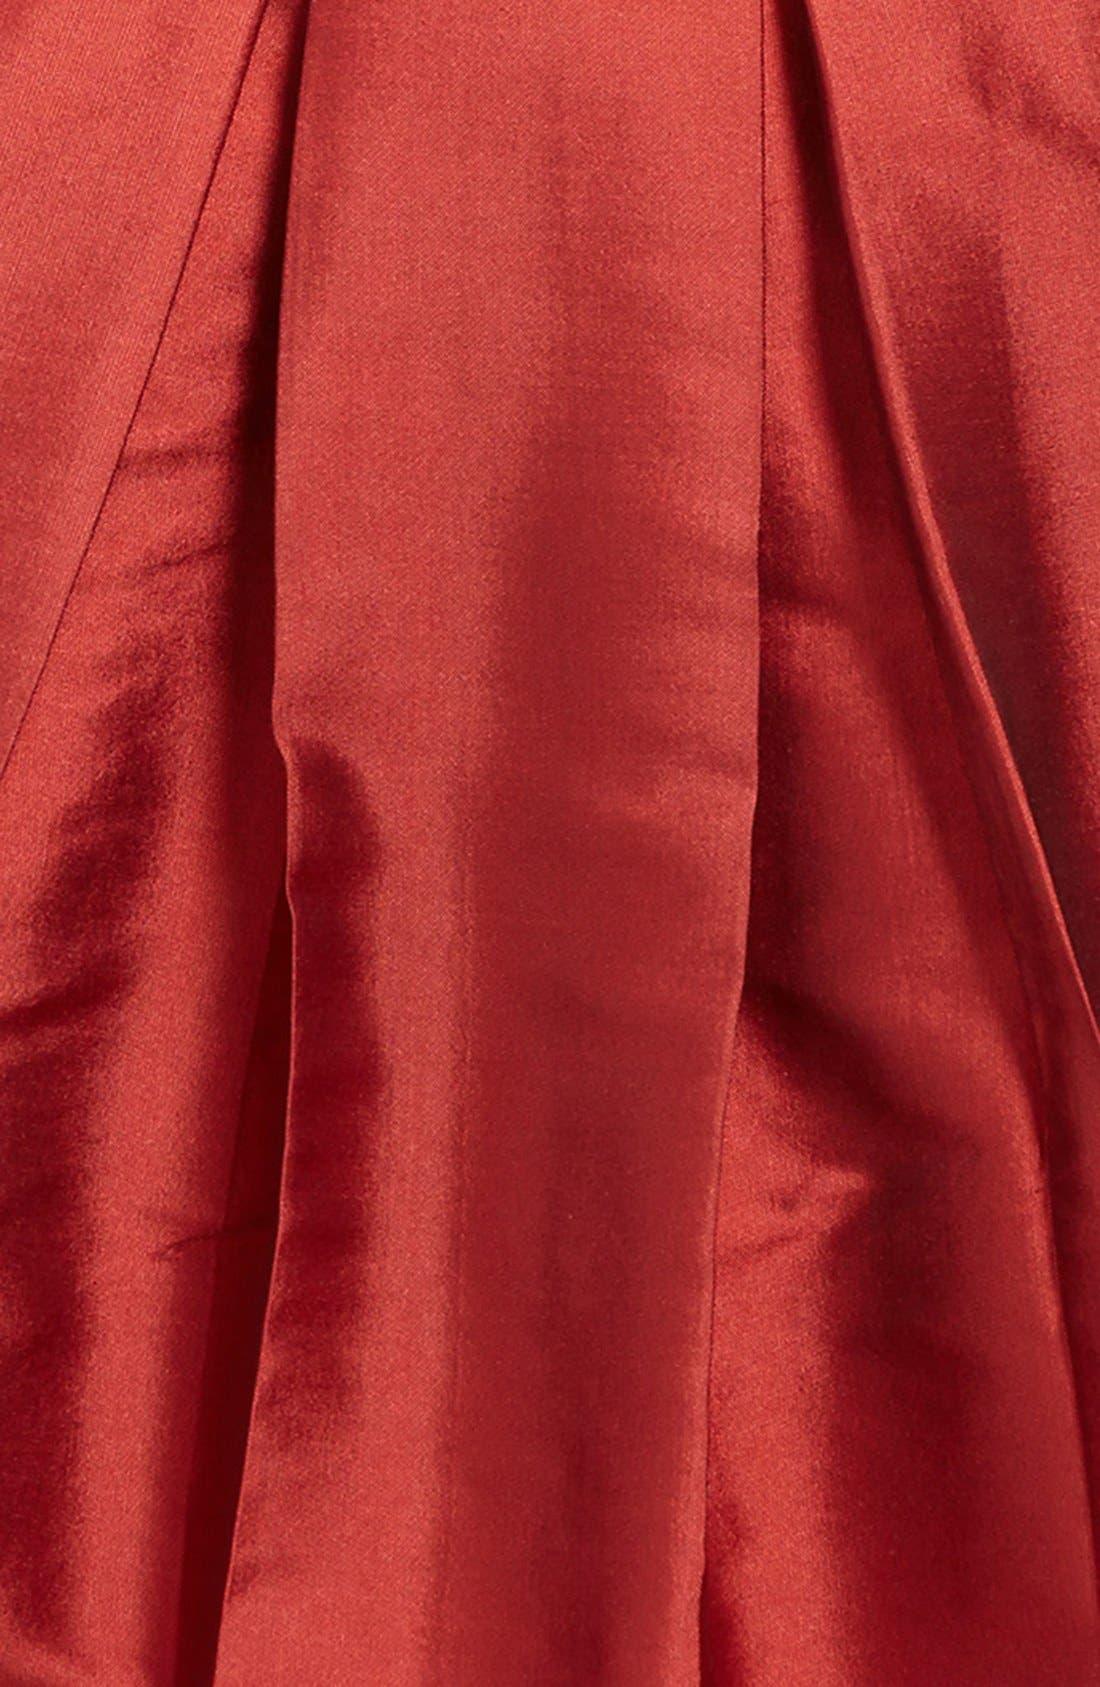 Alternate Image 3  - Isabel GarretonCap Sleeve Taffeta Dress (Toddler Girls, Little Girls & Big Girls)